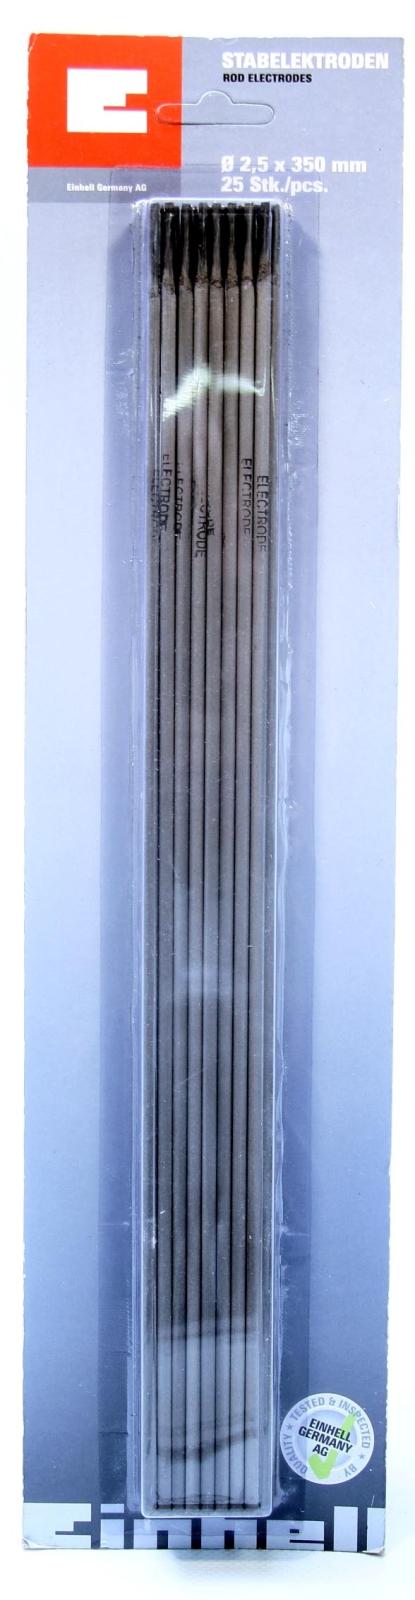 ELECTRODOS 2.5 x 350 mm.